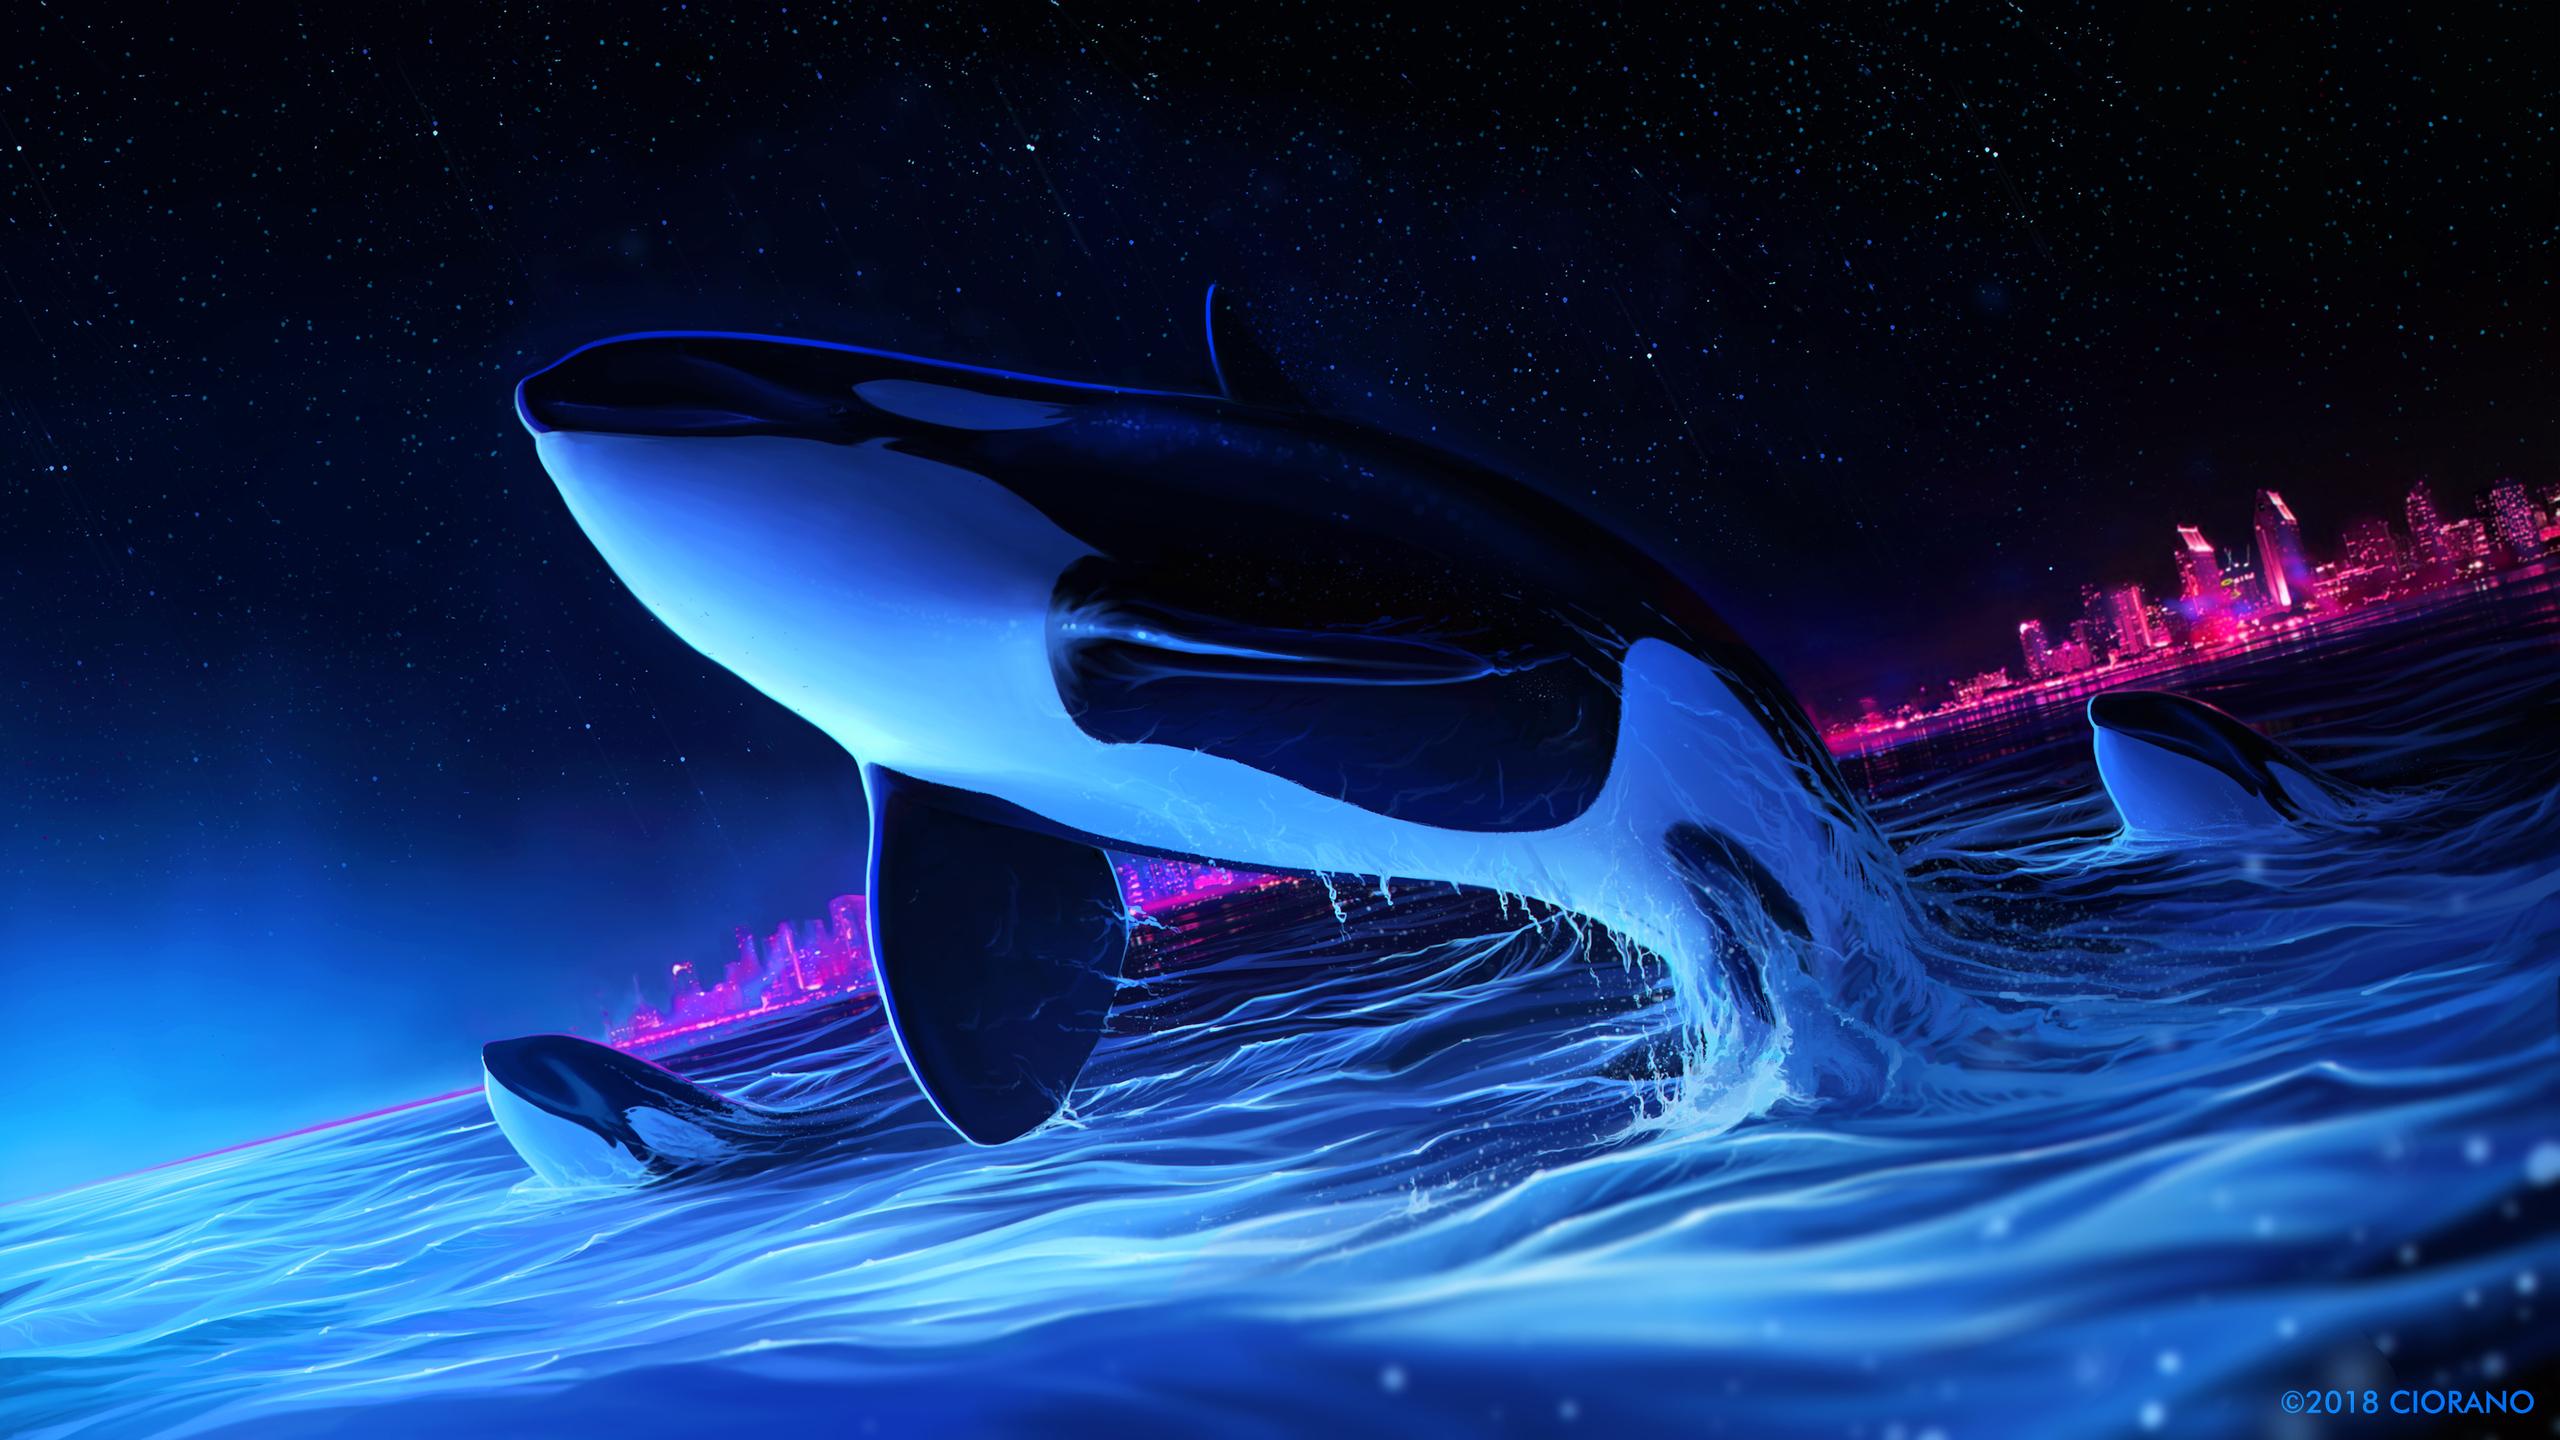 2560x1440 Dolphin Night Orca Whale Digital Art 1440p